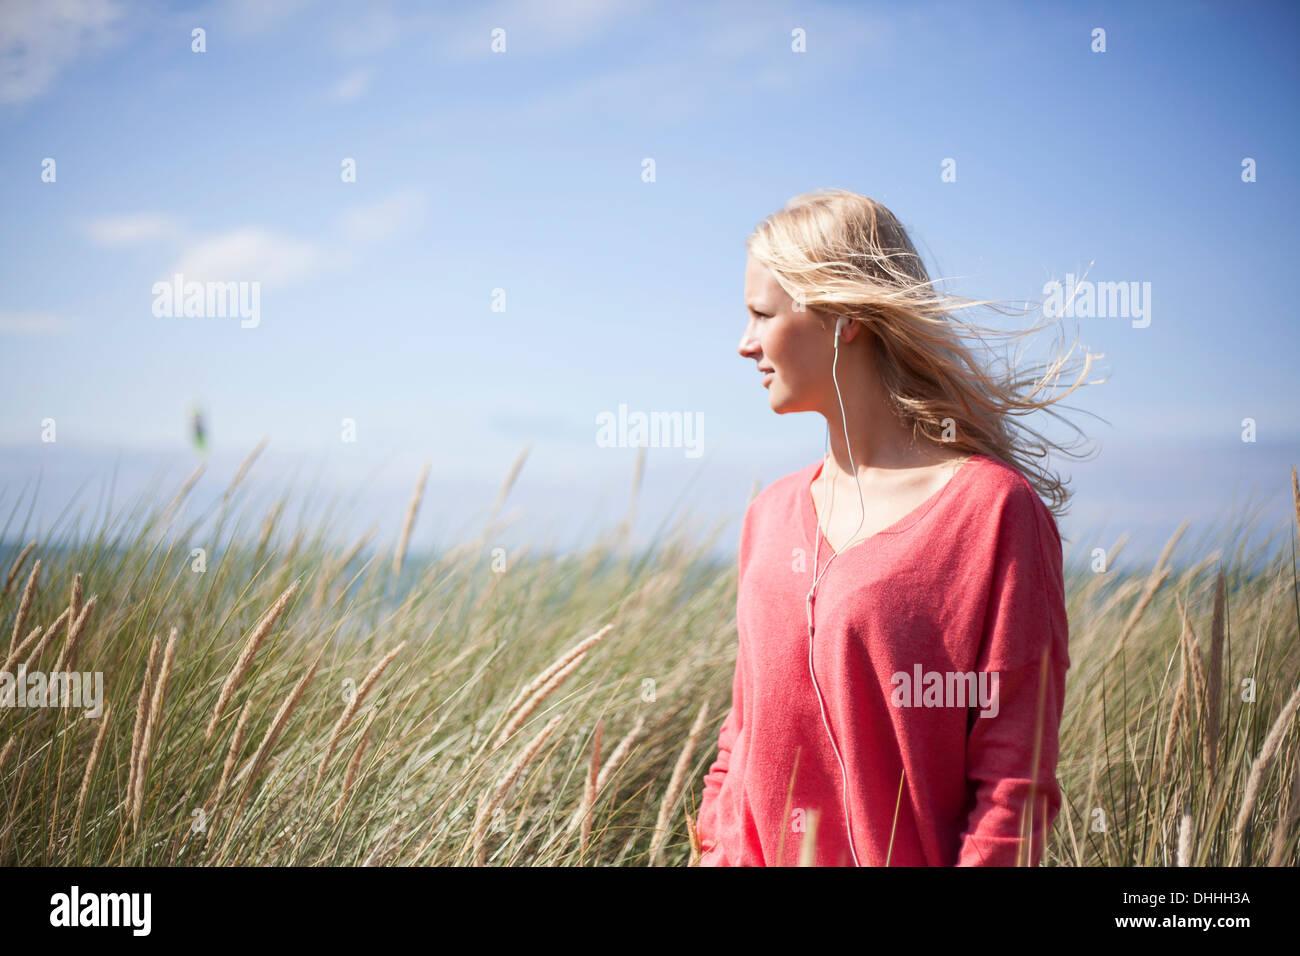 Portrait of blonde woman wearing pink sweater in marram grass, Wales, UK - Stock Image